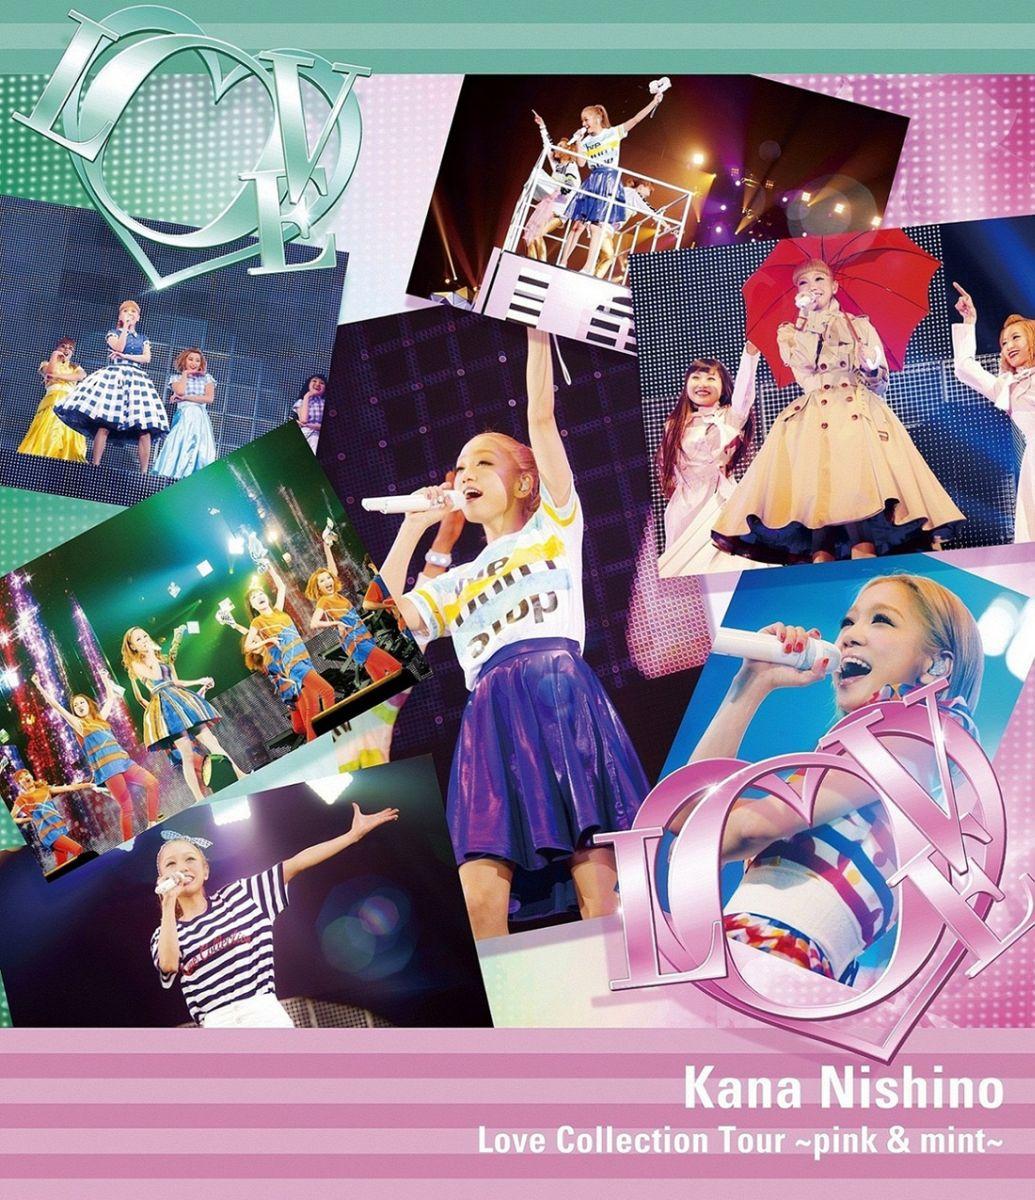 Love Collection Tour 〜pink & mint〜【通常盤】【Blu-ray】 [ 西野カナ ]